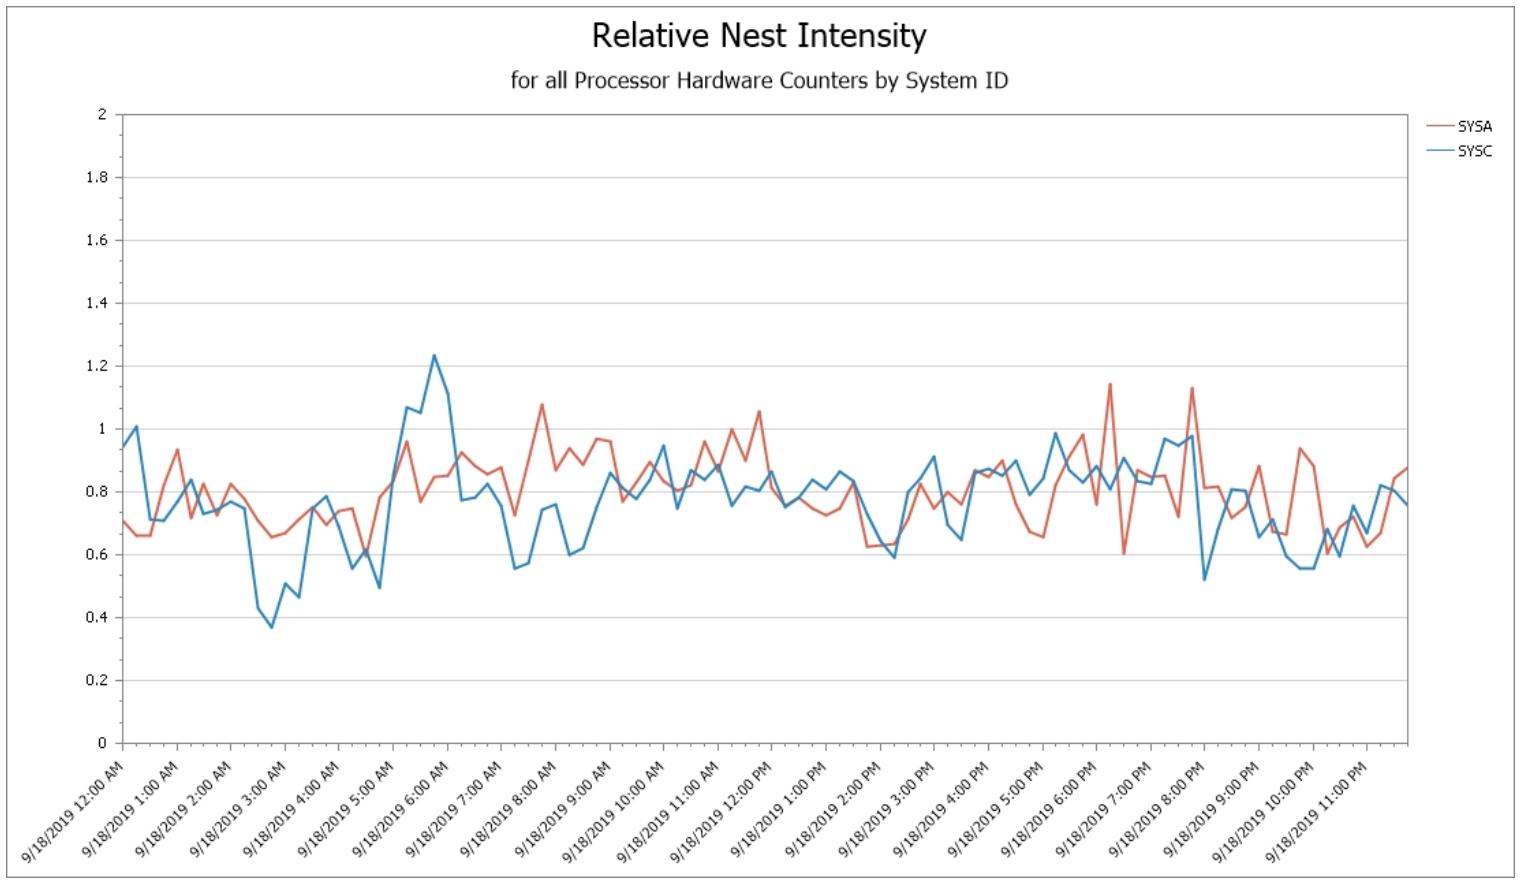 Relative Nest Intensity (RNI) by System